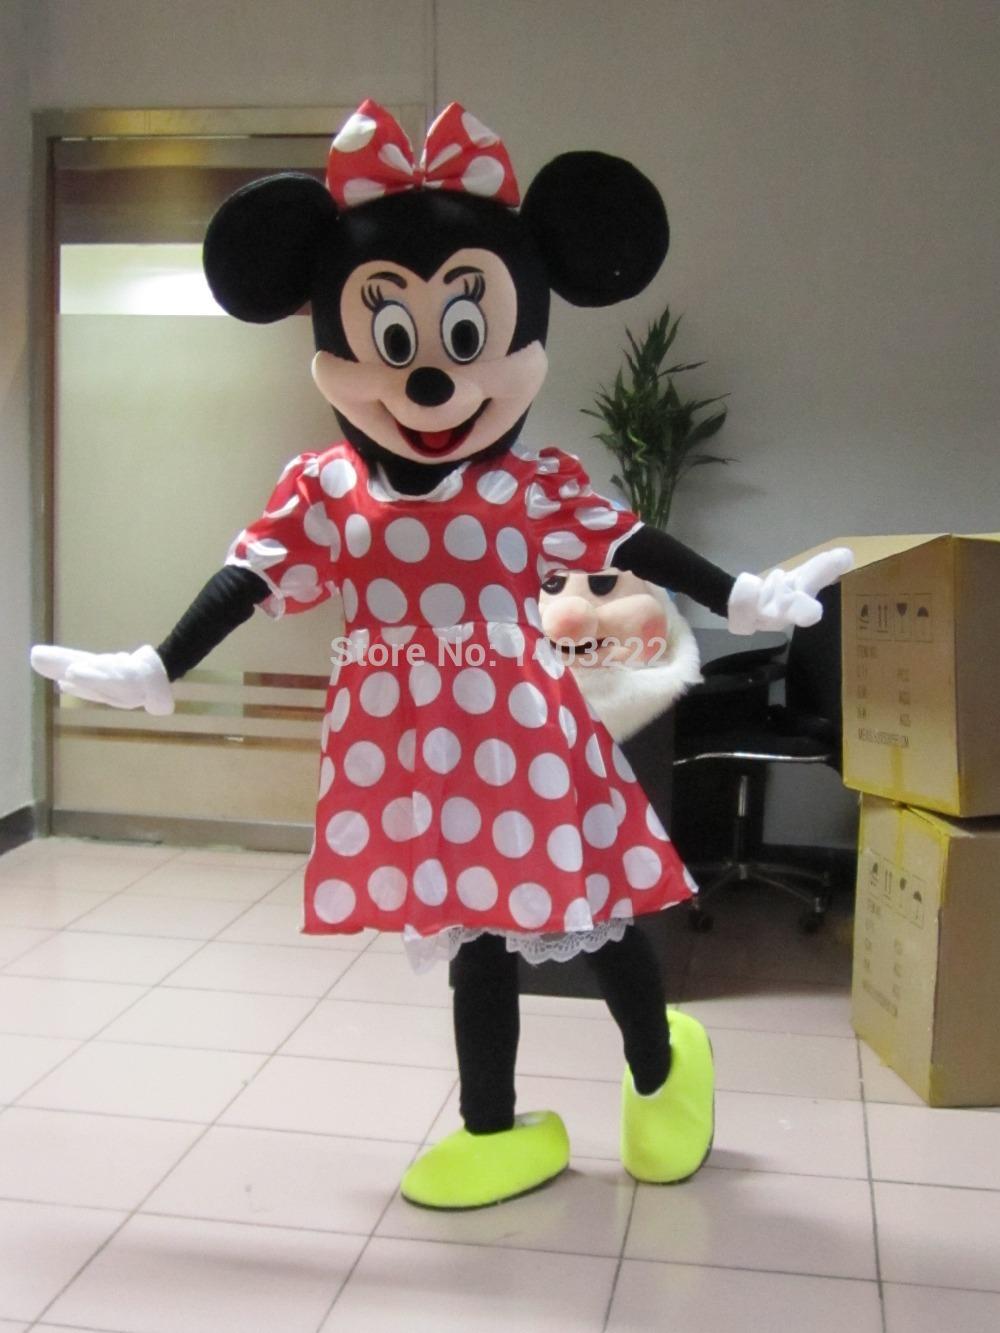 High quality Minnie Mascot Costume The adult size Minnie Mouse Mascot Costume Free Shipping(China (Mainland))